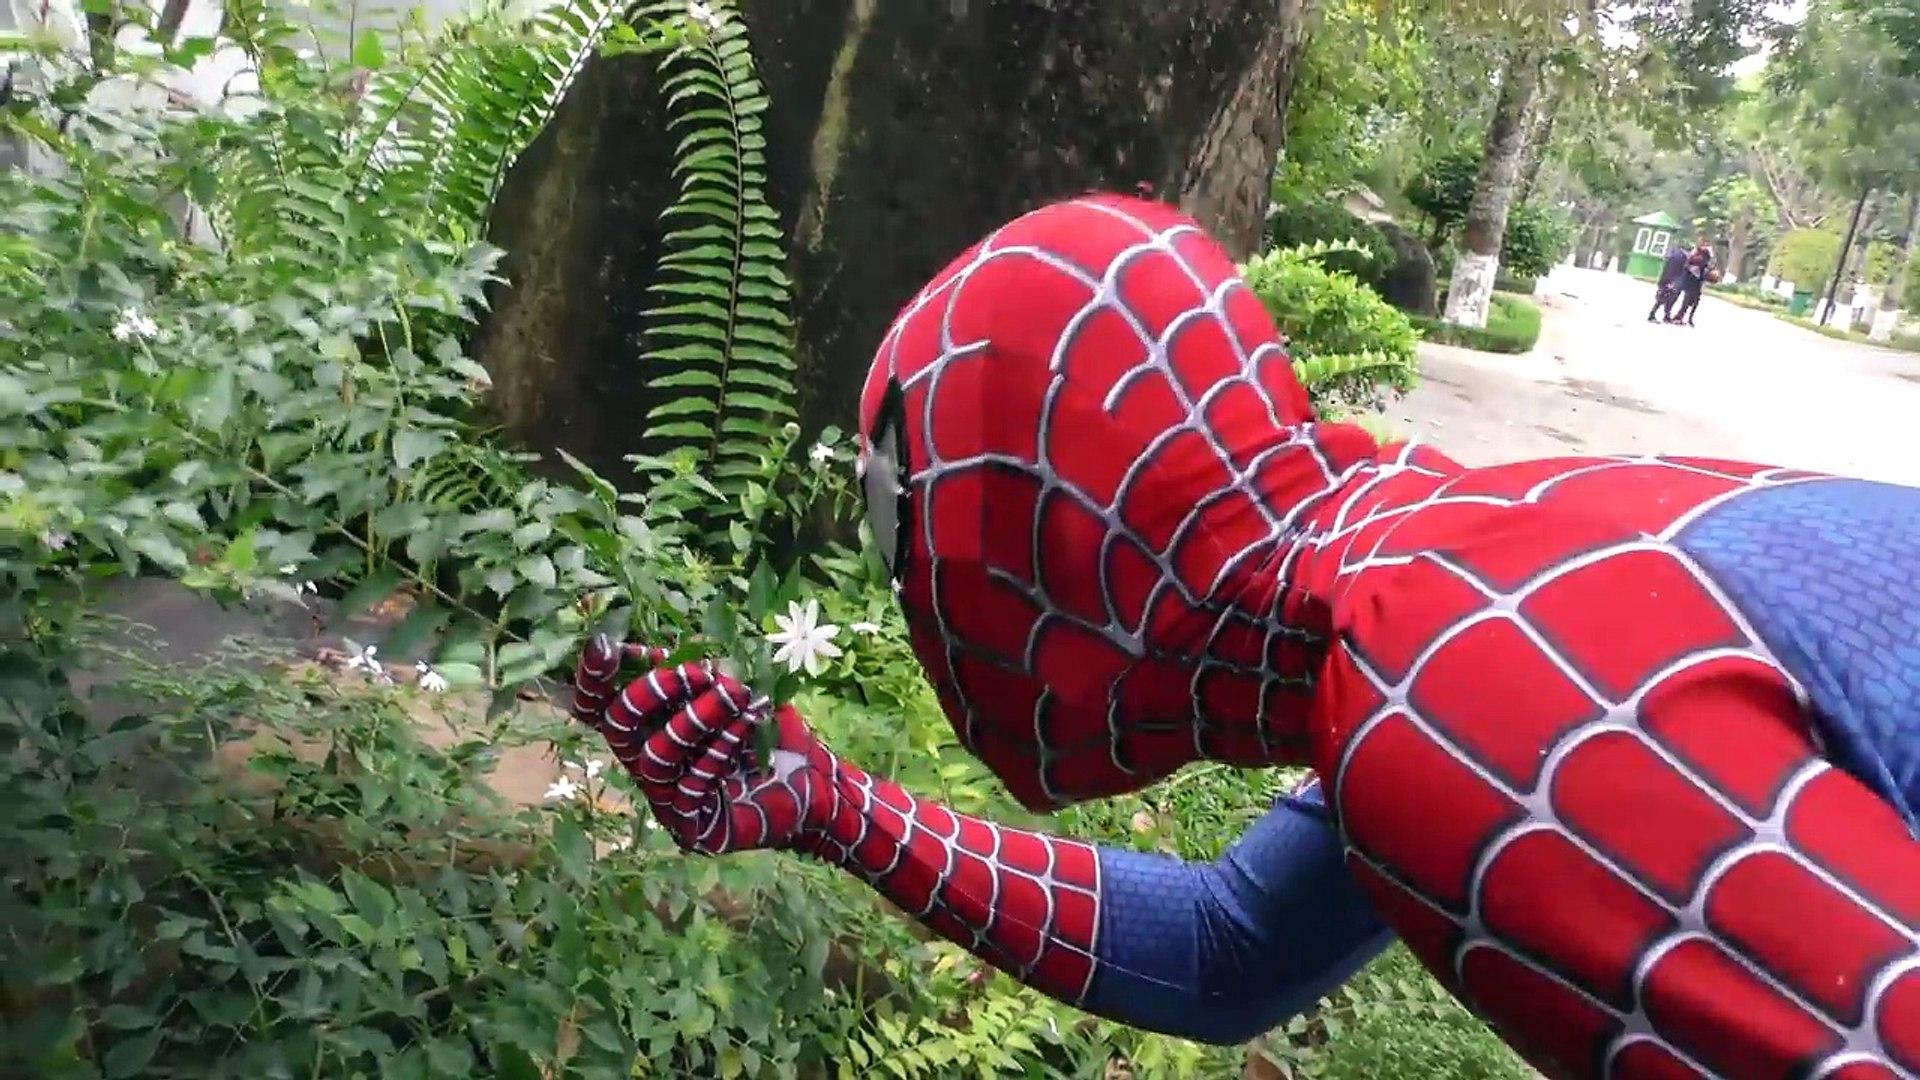 Superhero Spiderman SAW Monster Attack! Superheroes War ZOMBIE APOCALYPSE HULK JOKER Action Movies